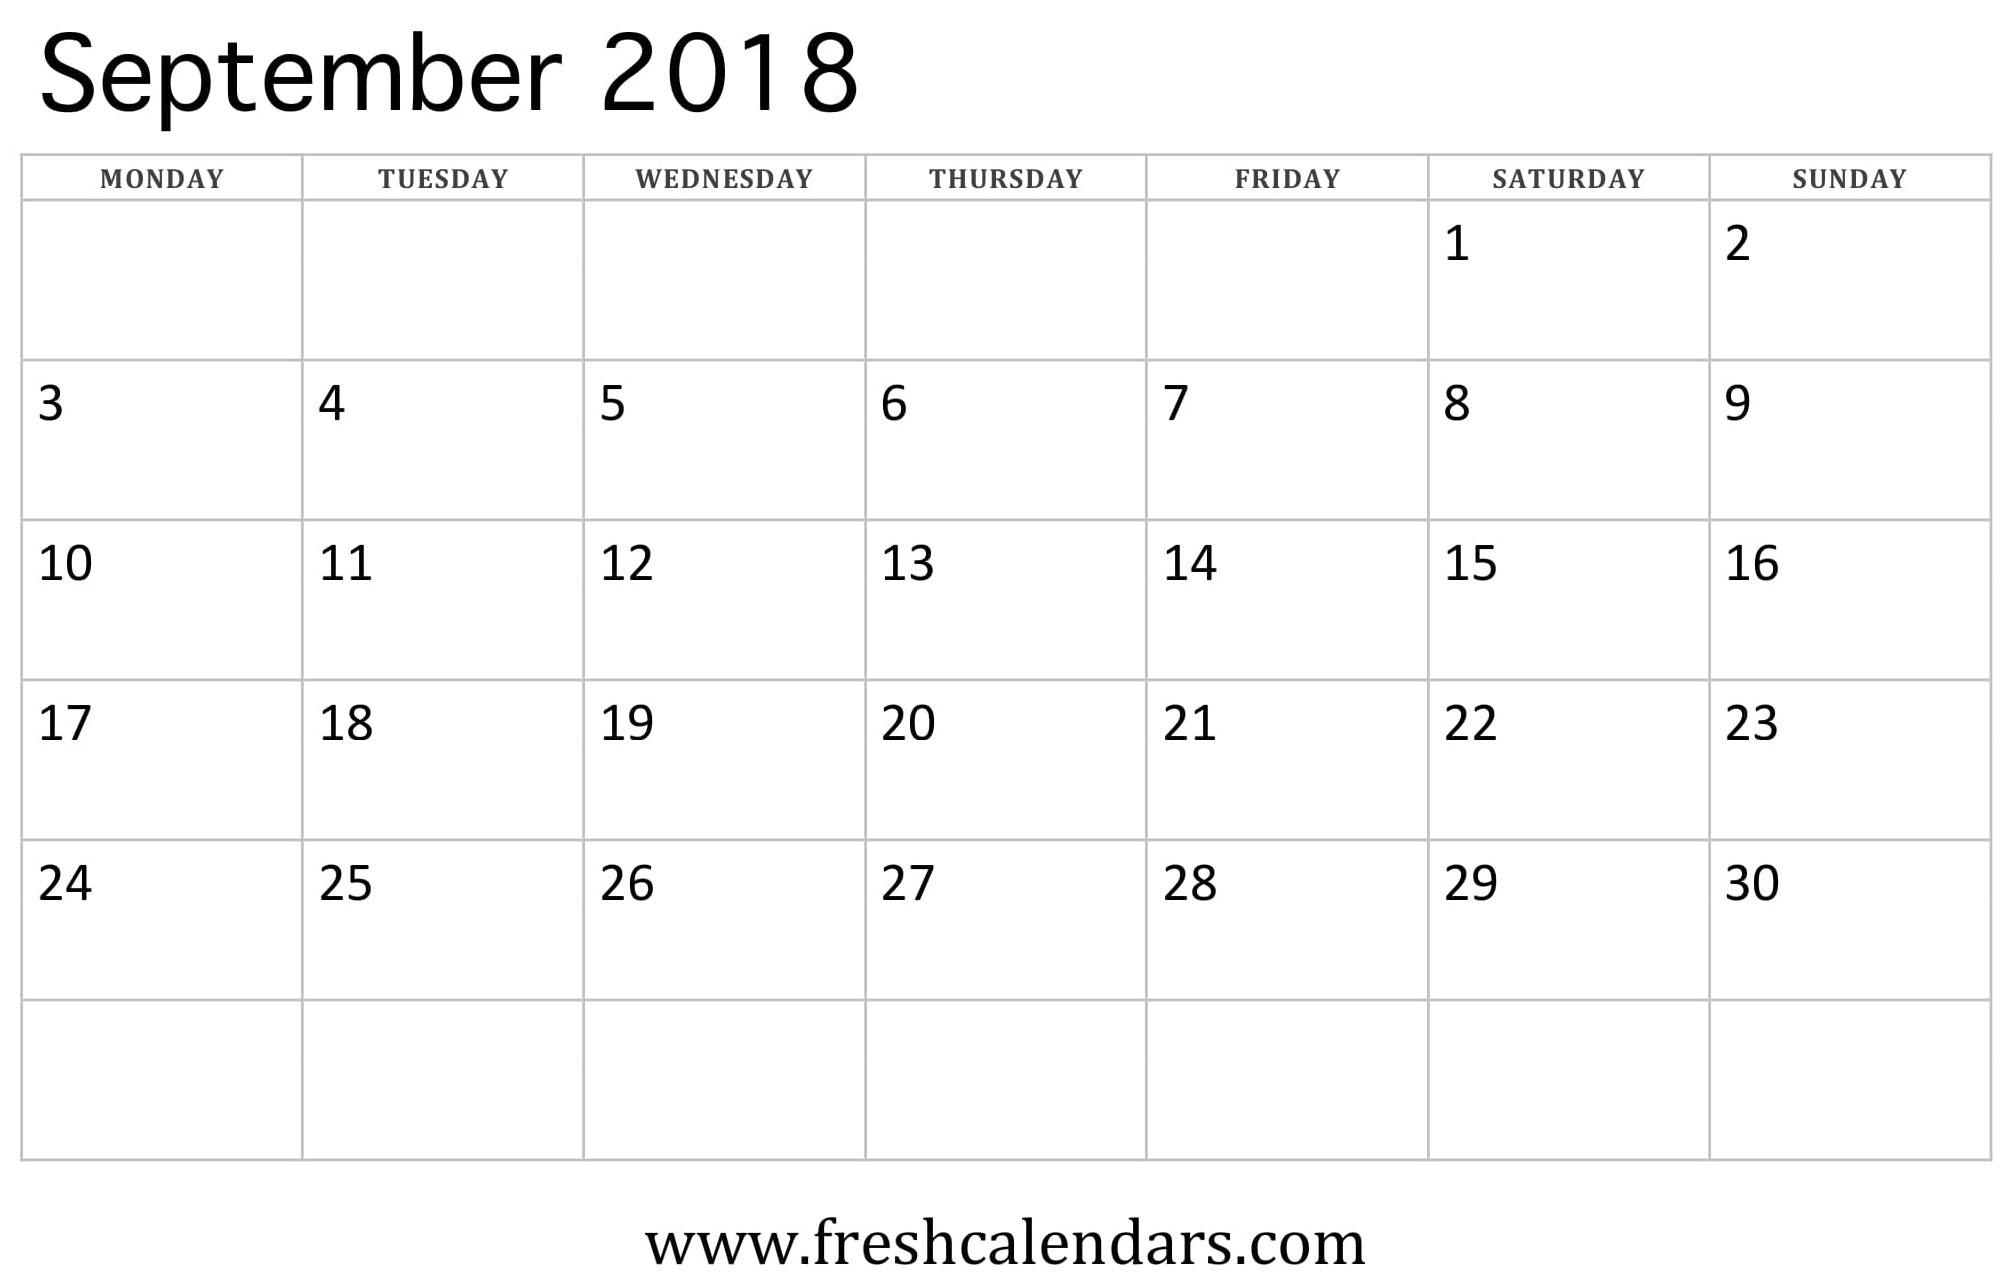 September 2018 Calendar Printable - Fresh Calendars